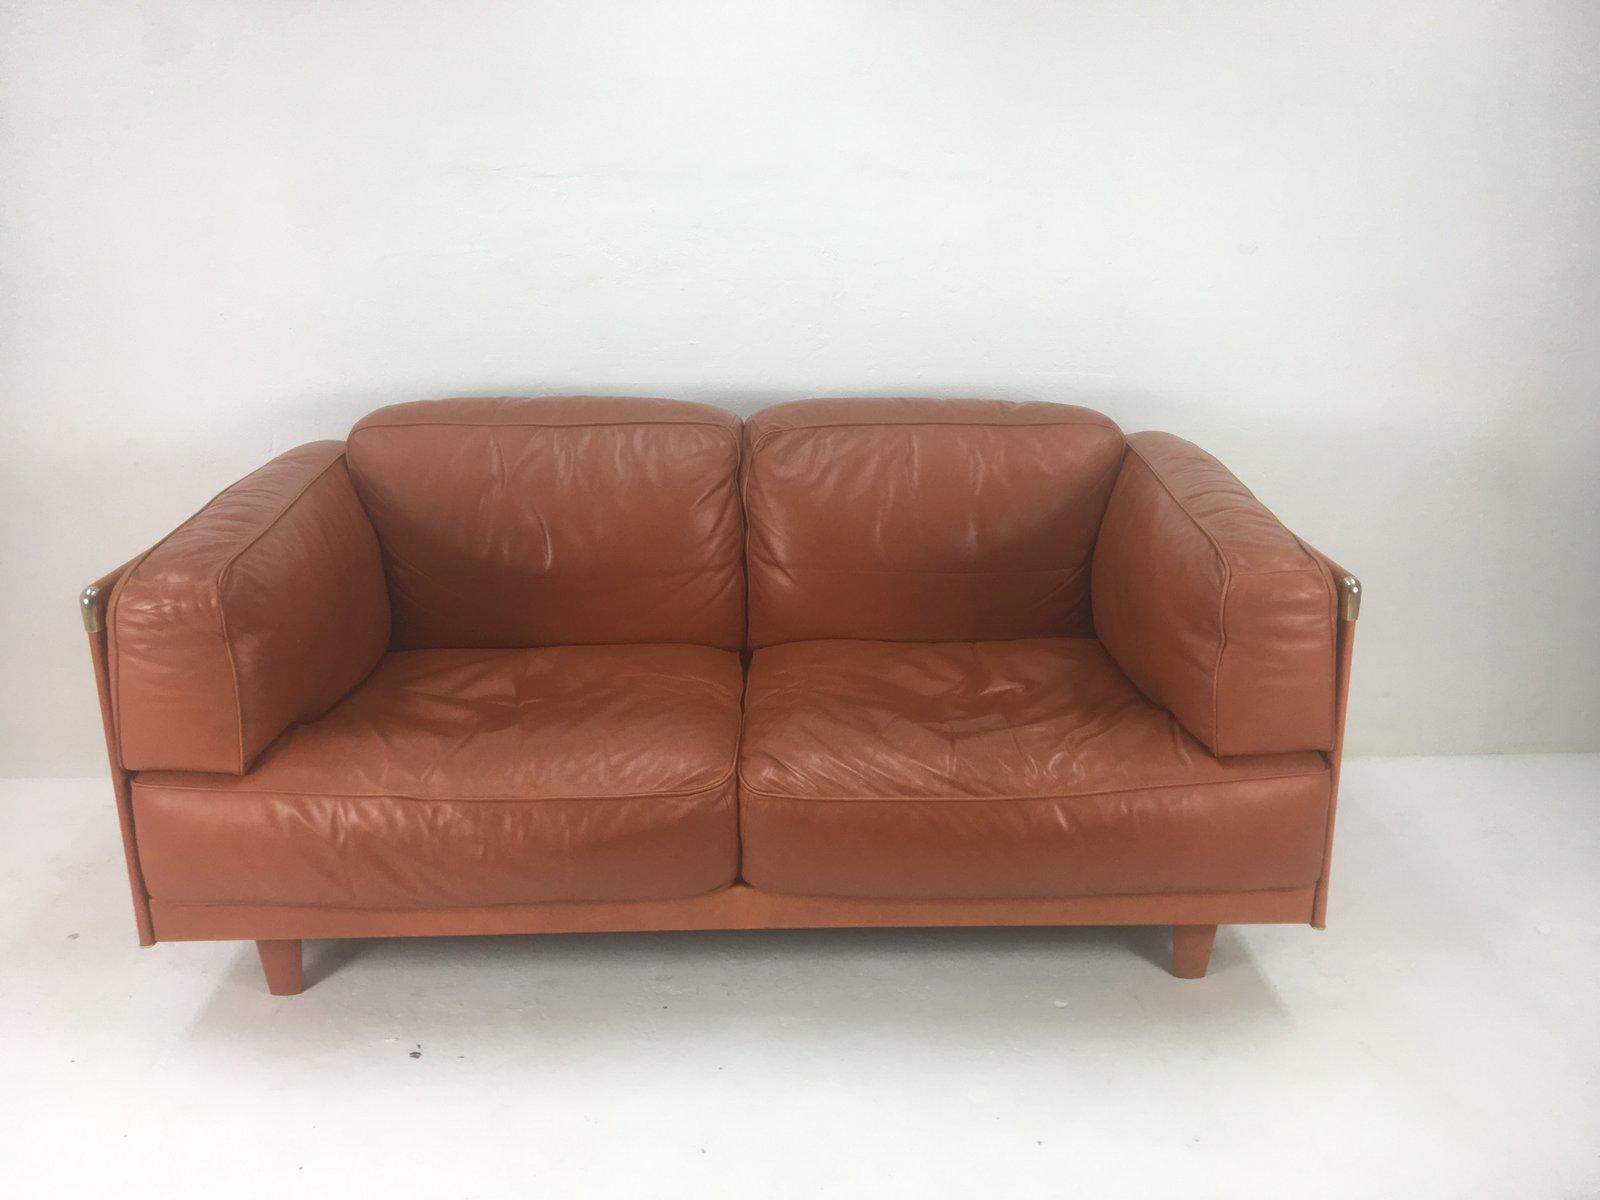 sofa set von poltrona frau 1986 bei pamono kaufen. Black Bedroom Furniture Sets. Home Design Ideas